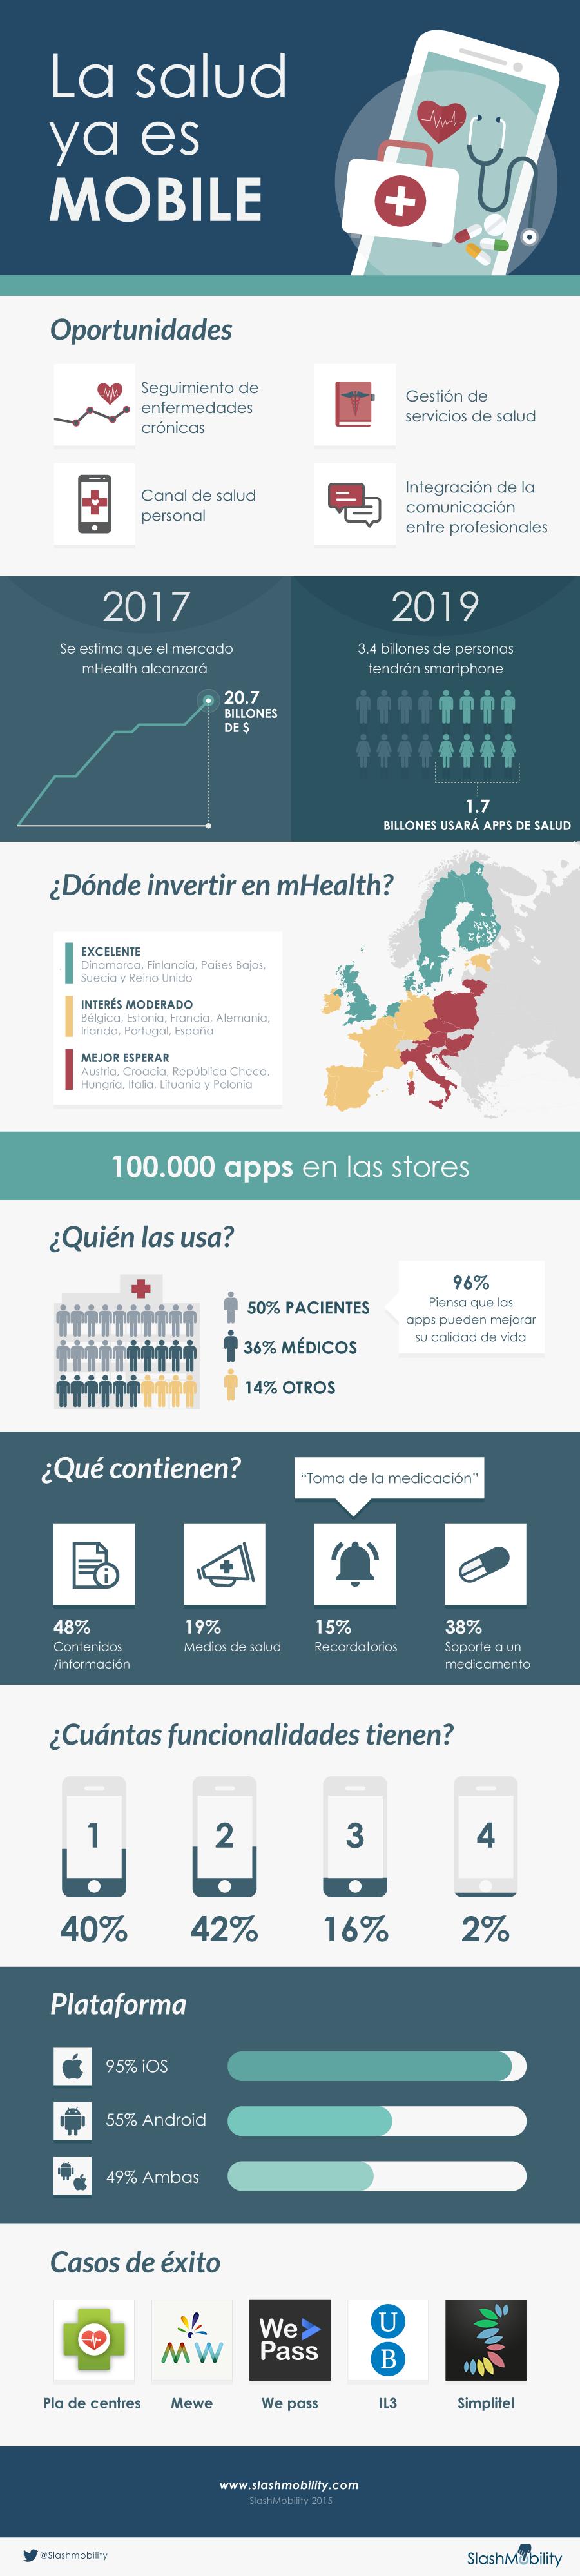 infografia-mhealth